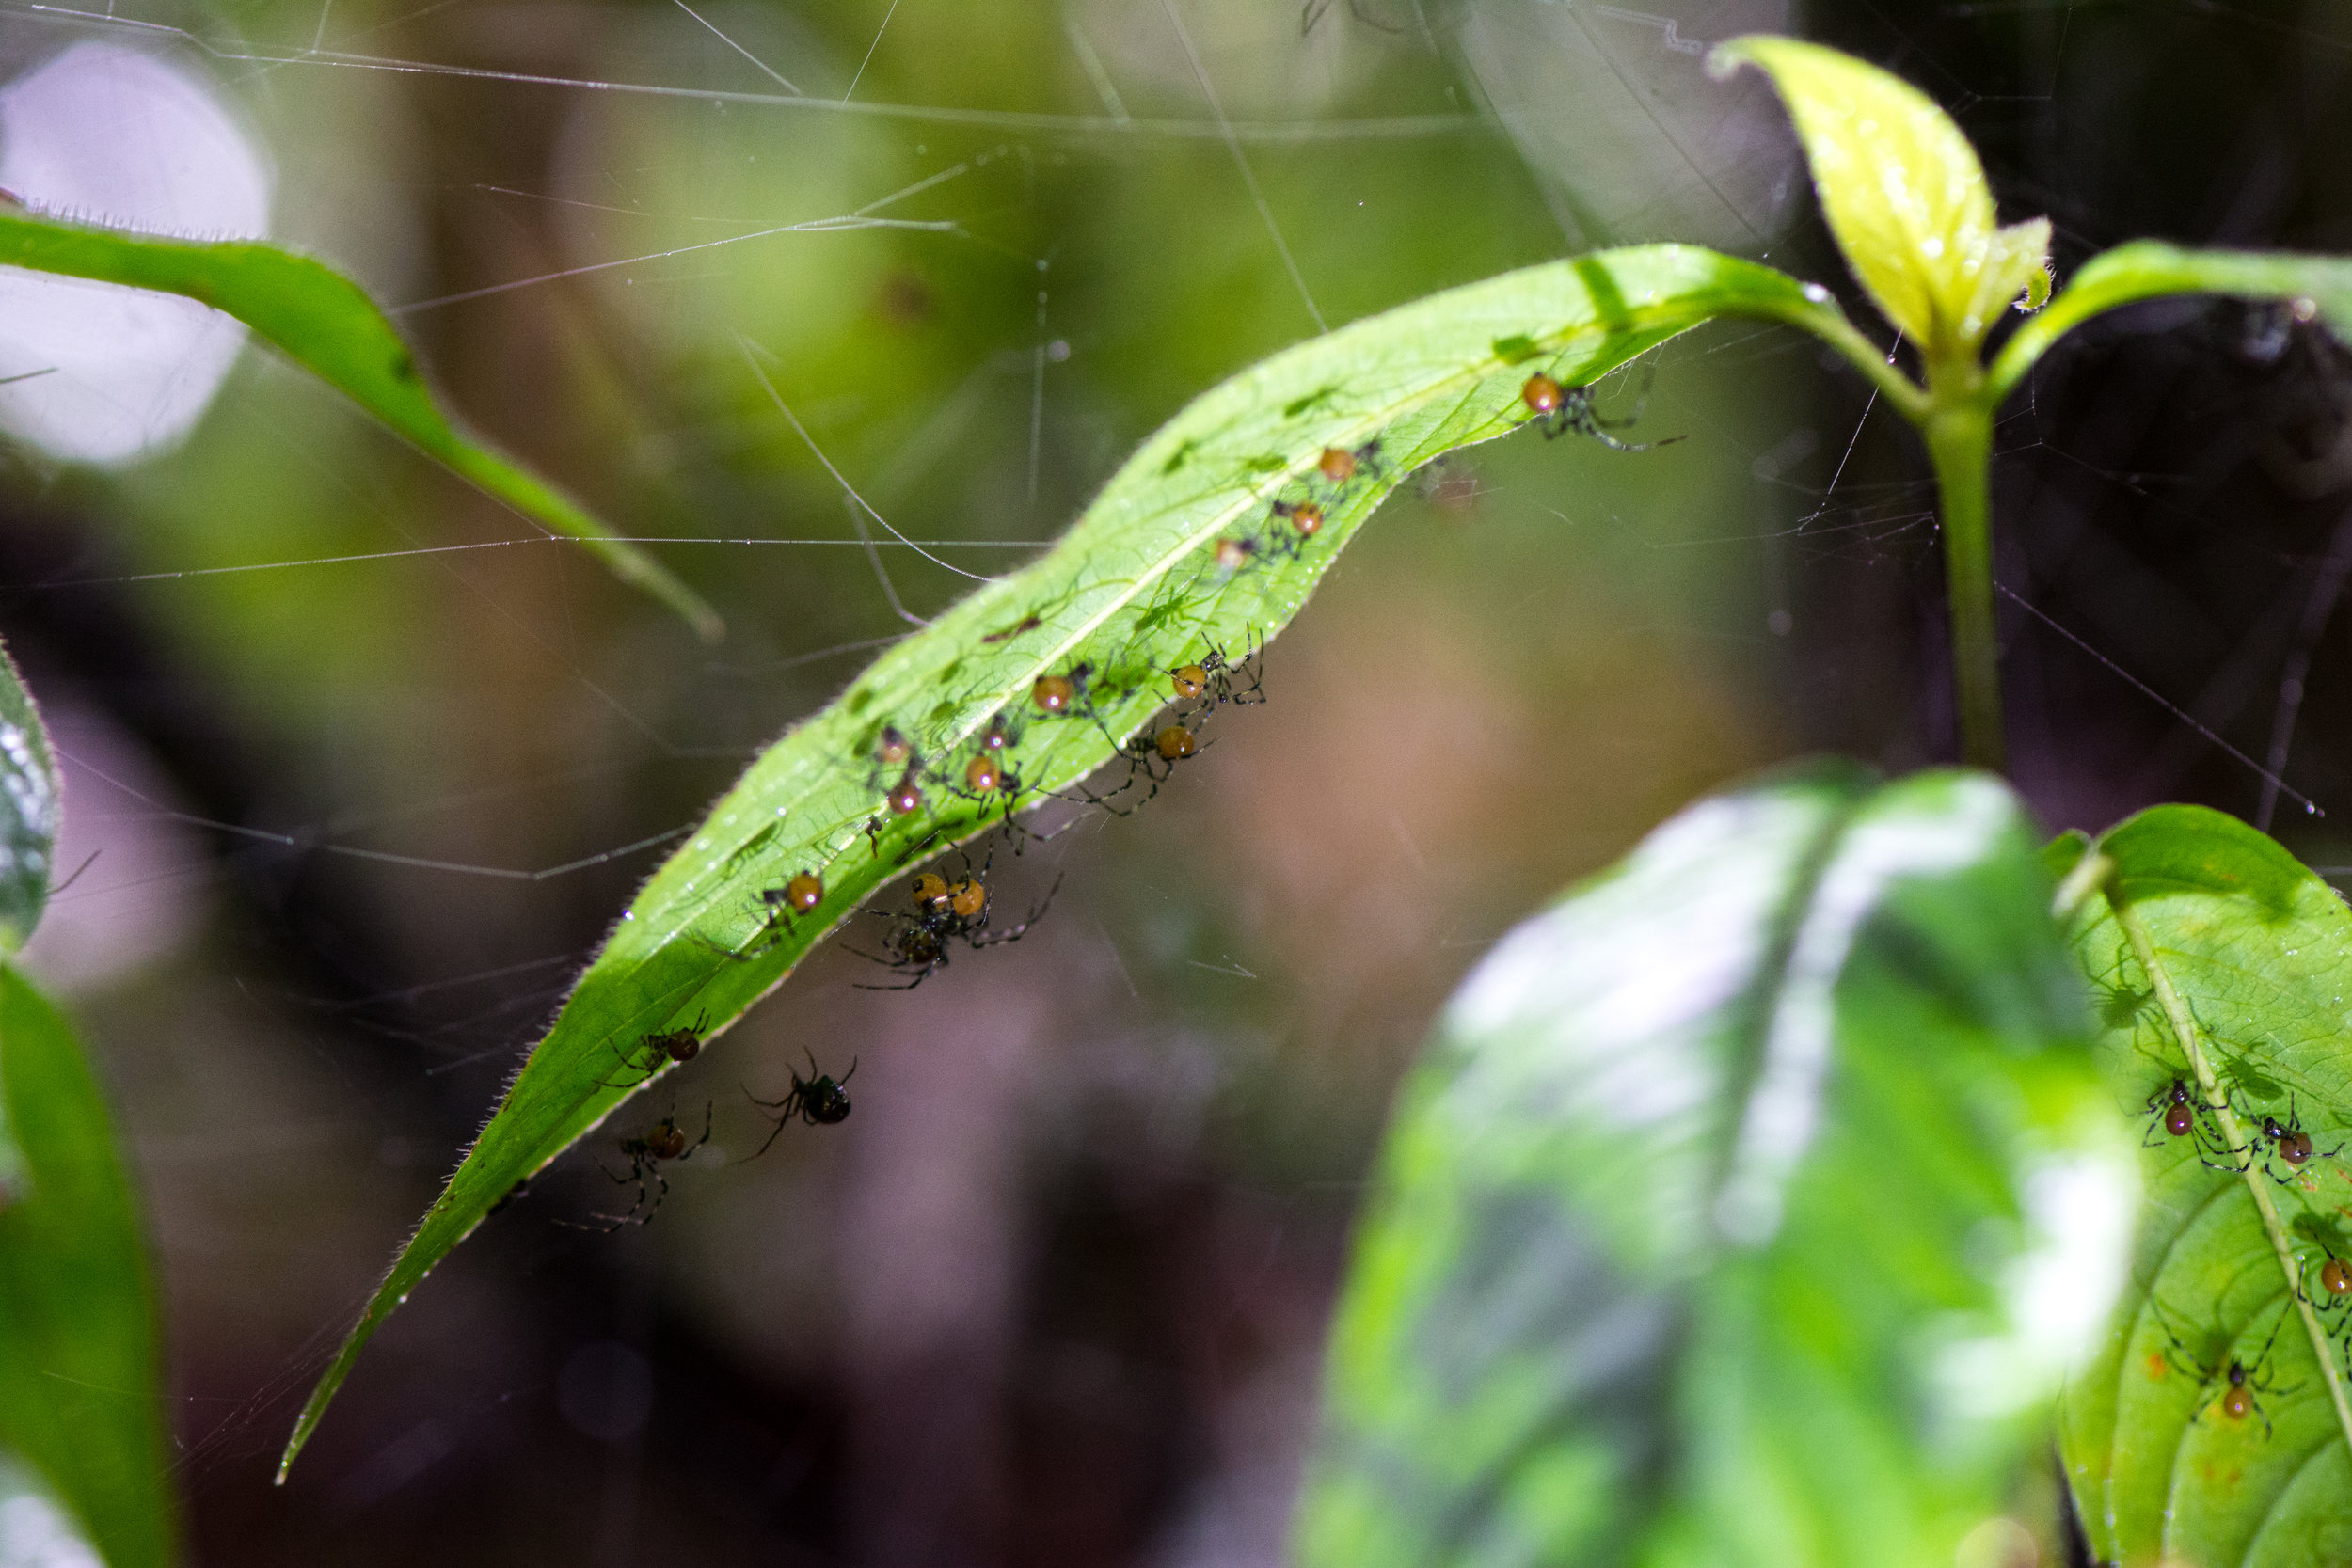 community-spider-eilidh-munro